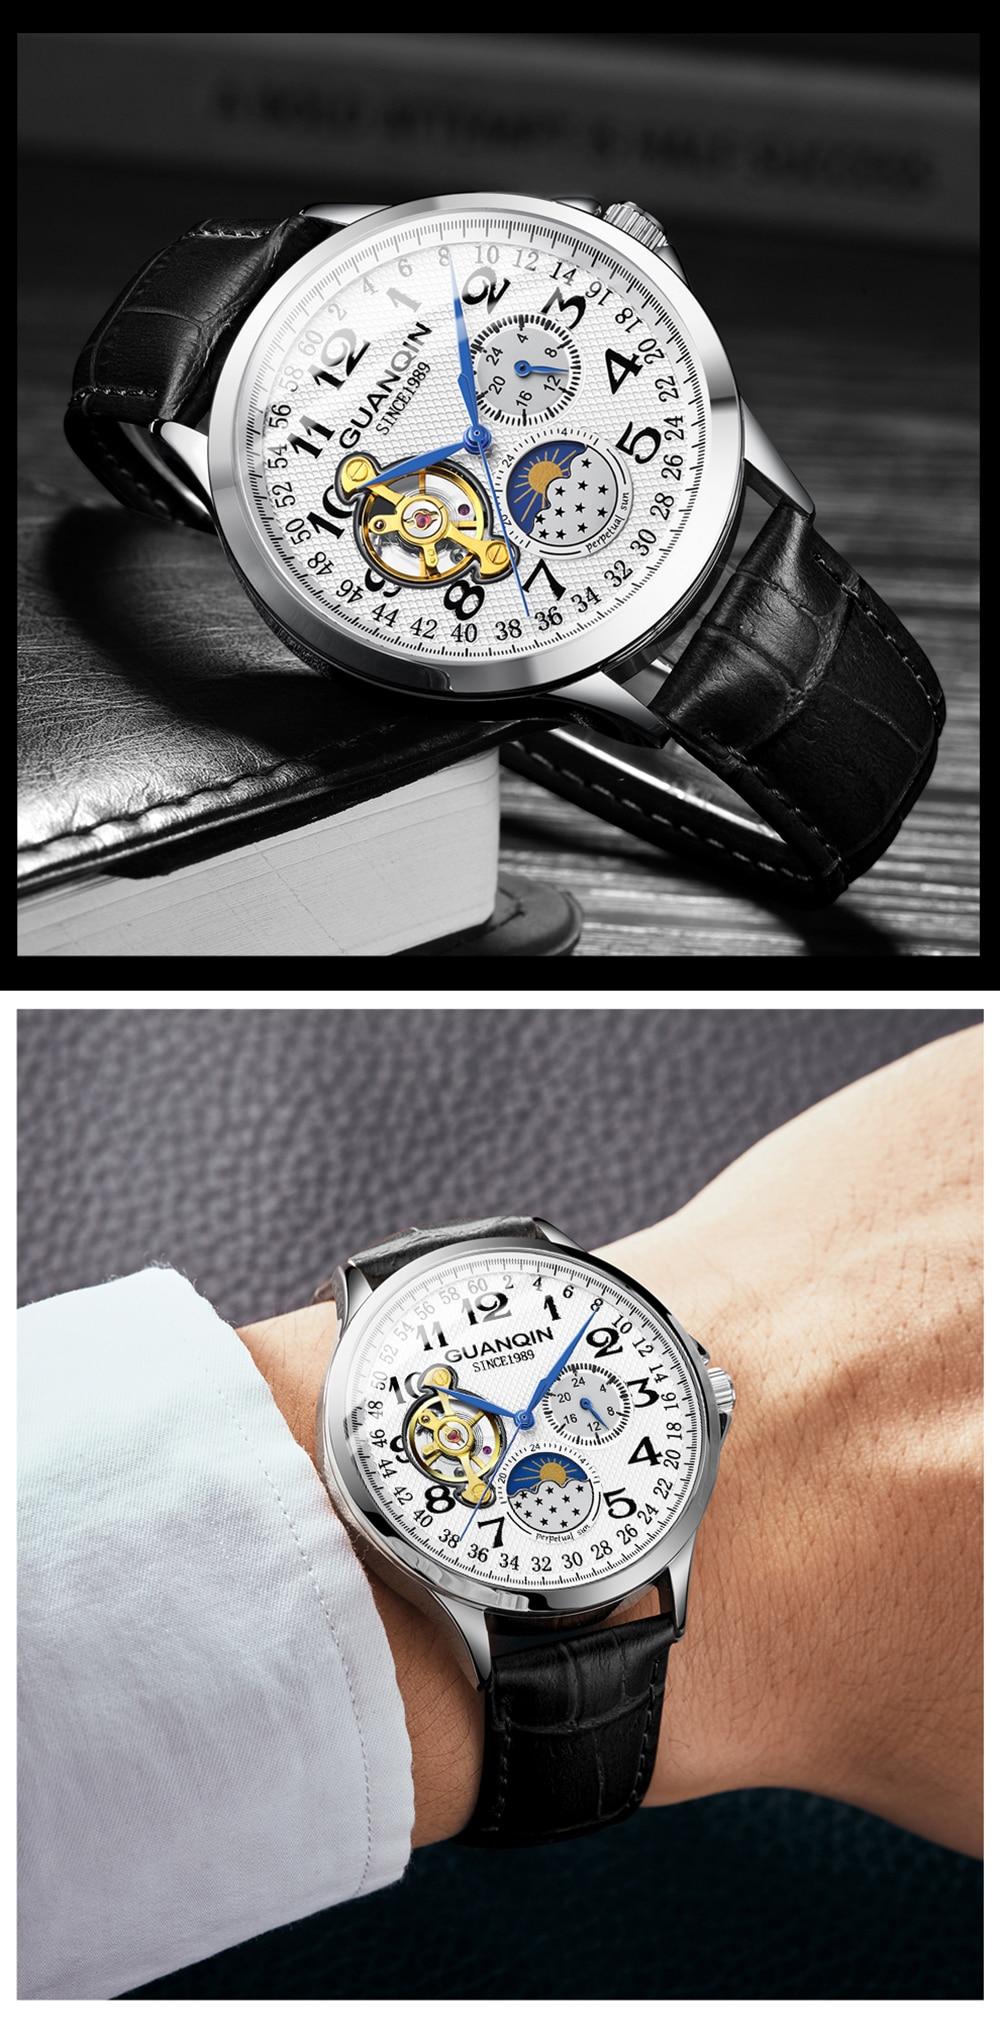 2019 Fashion GUANQIN Mens Watches Top Brand Luxury Skeleton Watch Men Sport Leather Tourbillon Automatic Mechanical Wristwatch